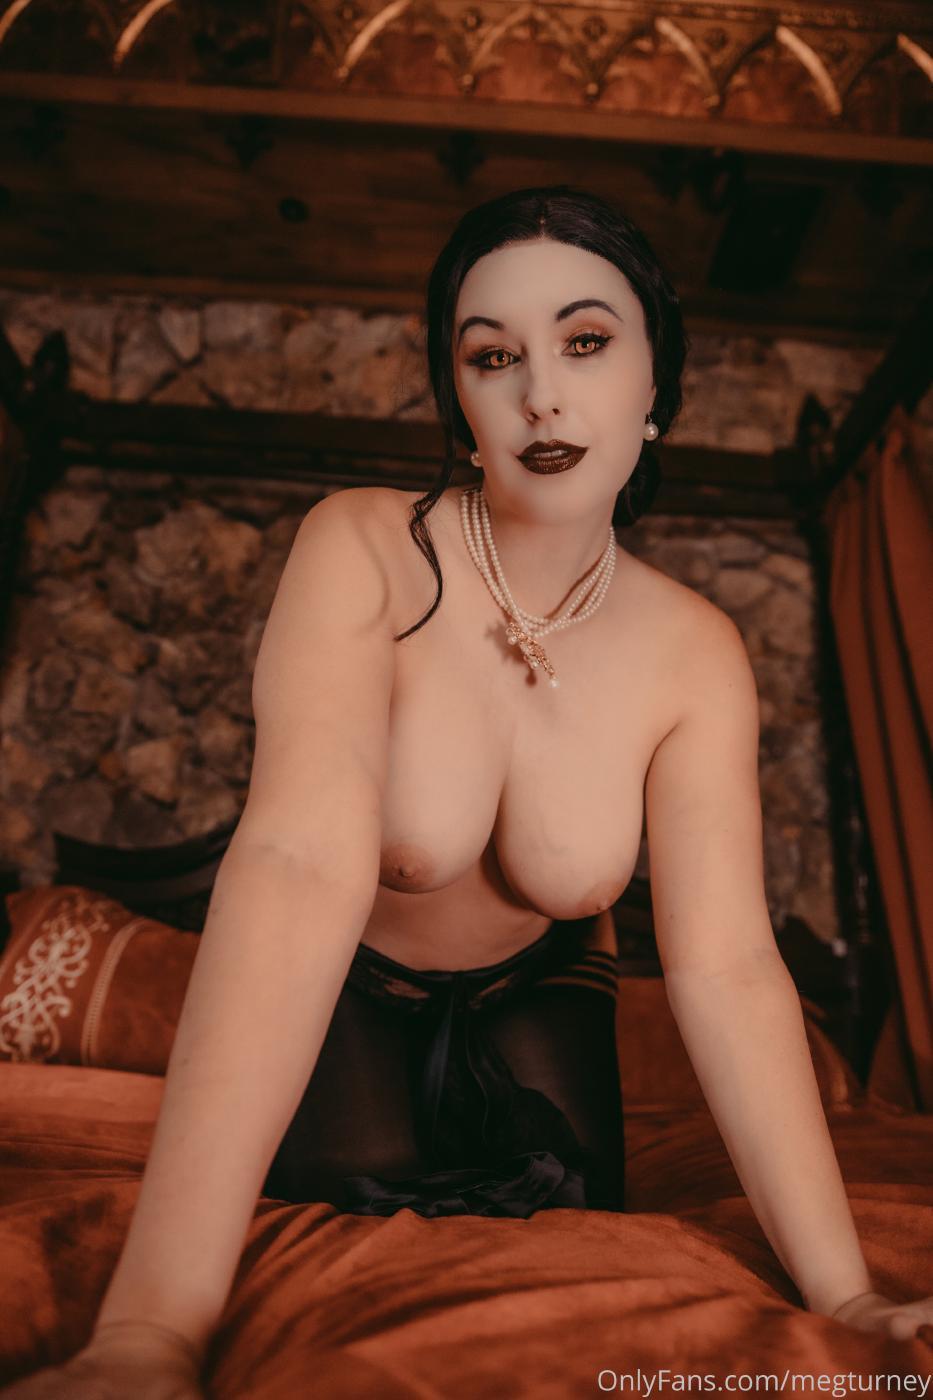 Meg Turney Lady Dimitrescu Cosplay Onlyfans Set Leaked 0003